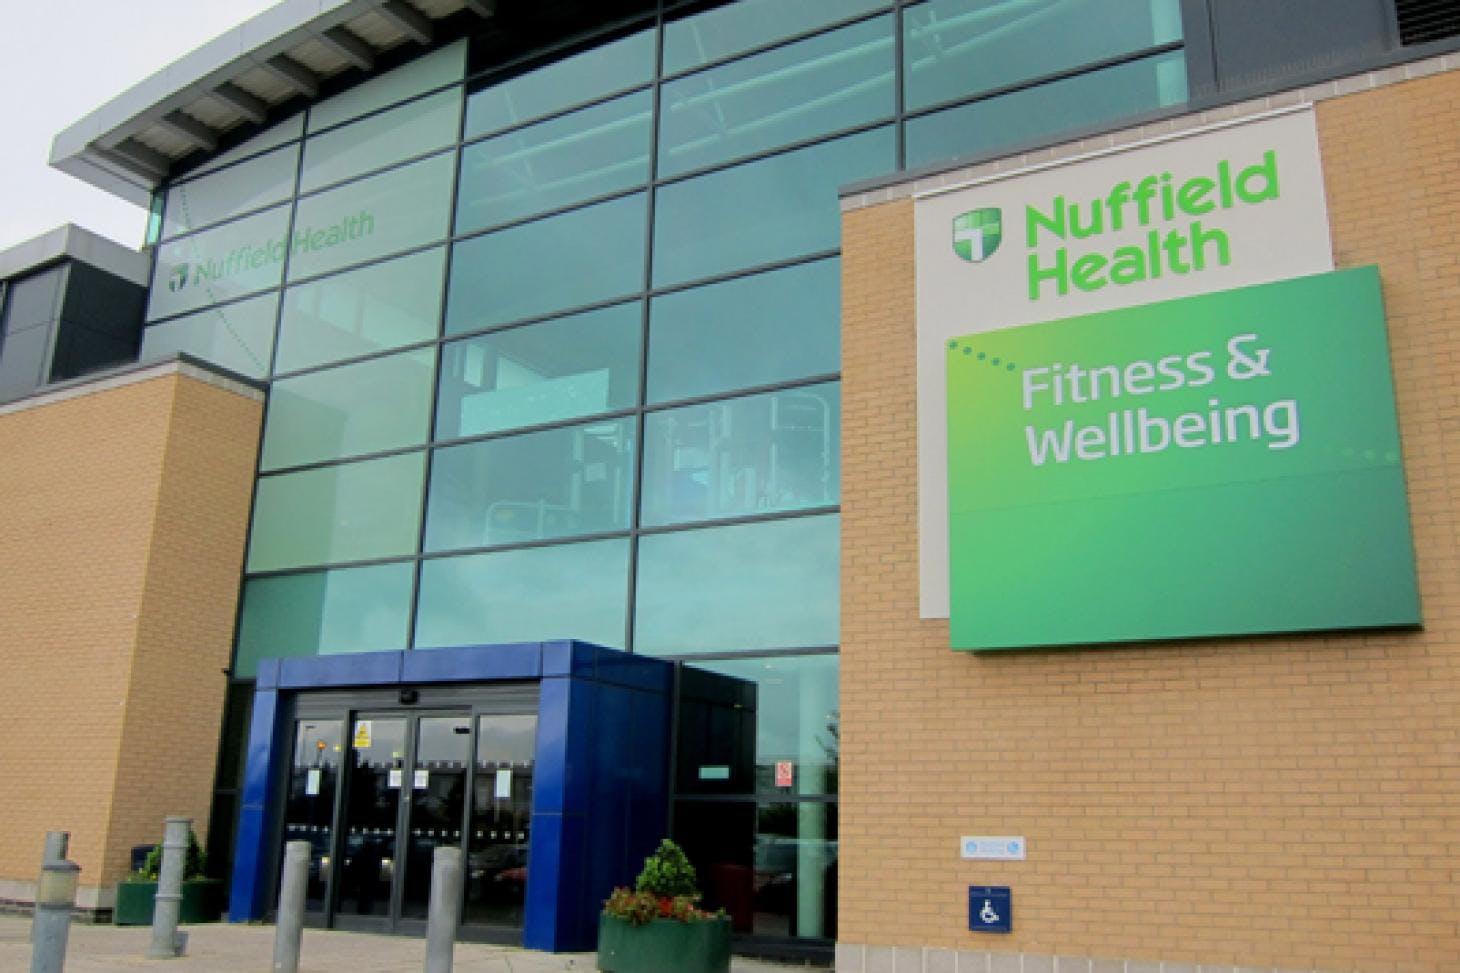 Nuffield Health Norbury Outdoor | Hard (macadam) tennis court